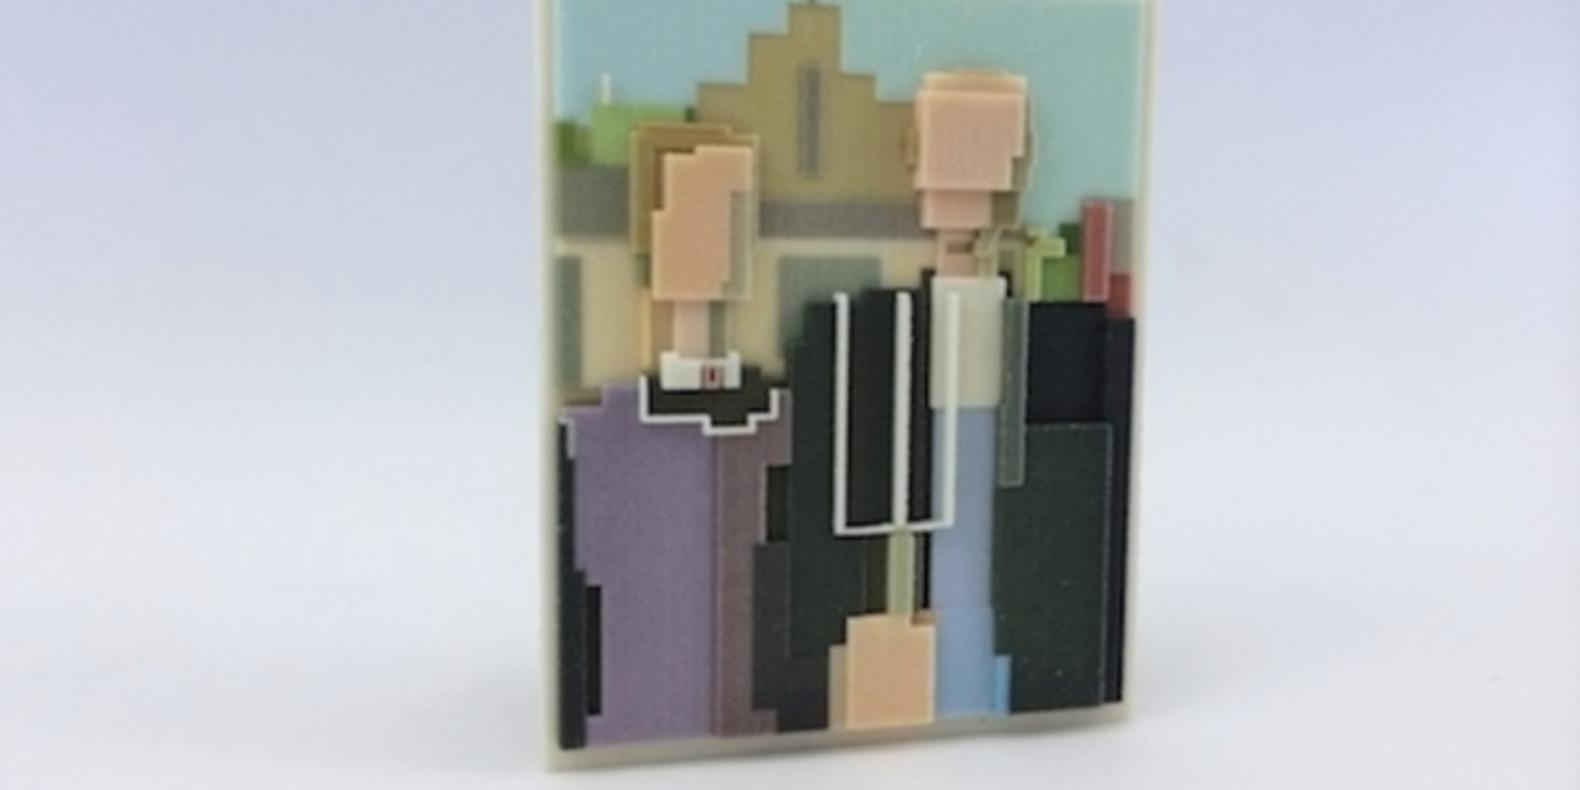 adam lister isaac budmen 8 Bits, 3 Dimensions art 3D printing printed cults3D fichier 3D designer artist ETR breaking bad superman mona lisa9